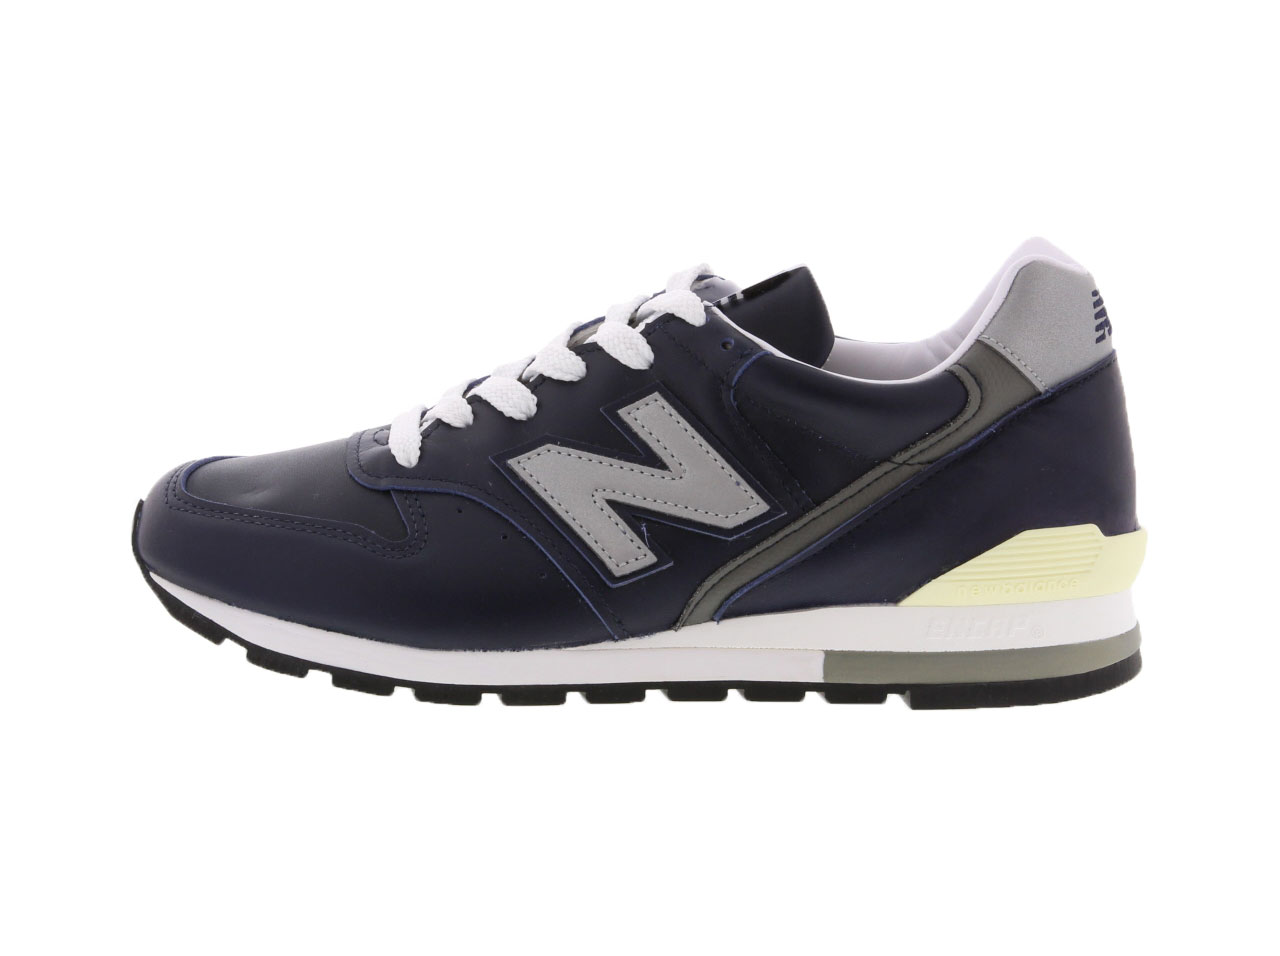 NEW BALANCE(M996NCB)【ニューバランス】【メンズファッション】【シューズ】【スニーカー】【靴】【フットウェア】